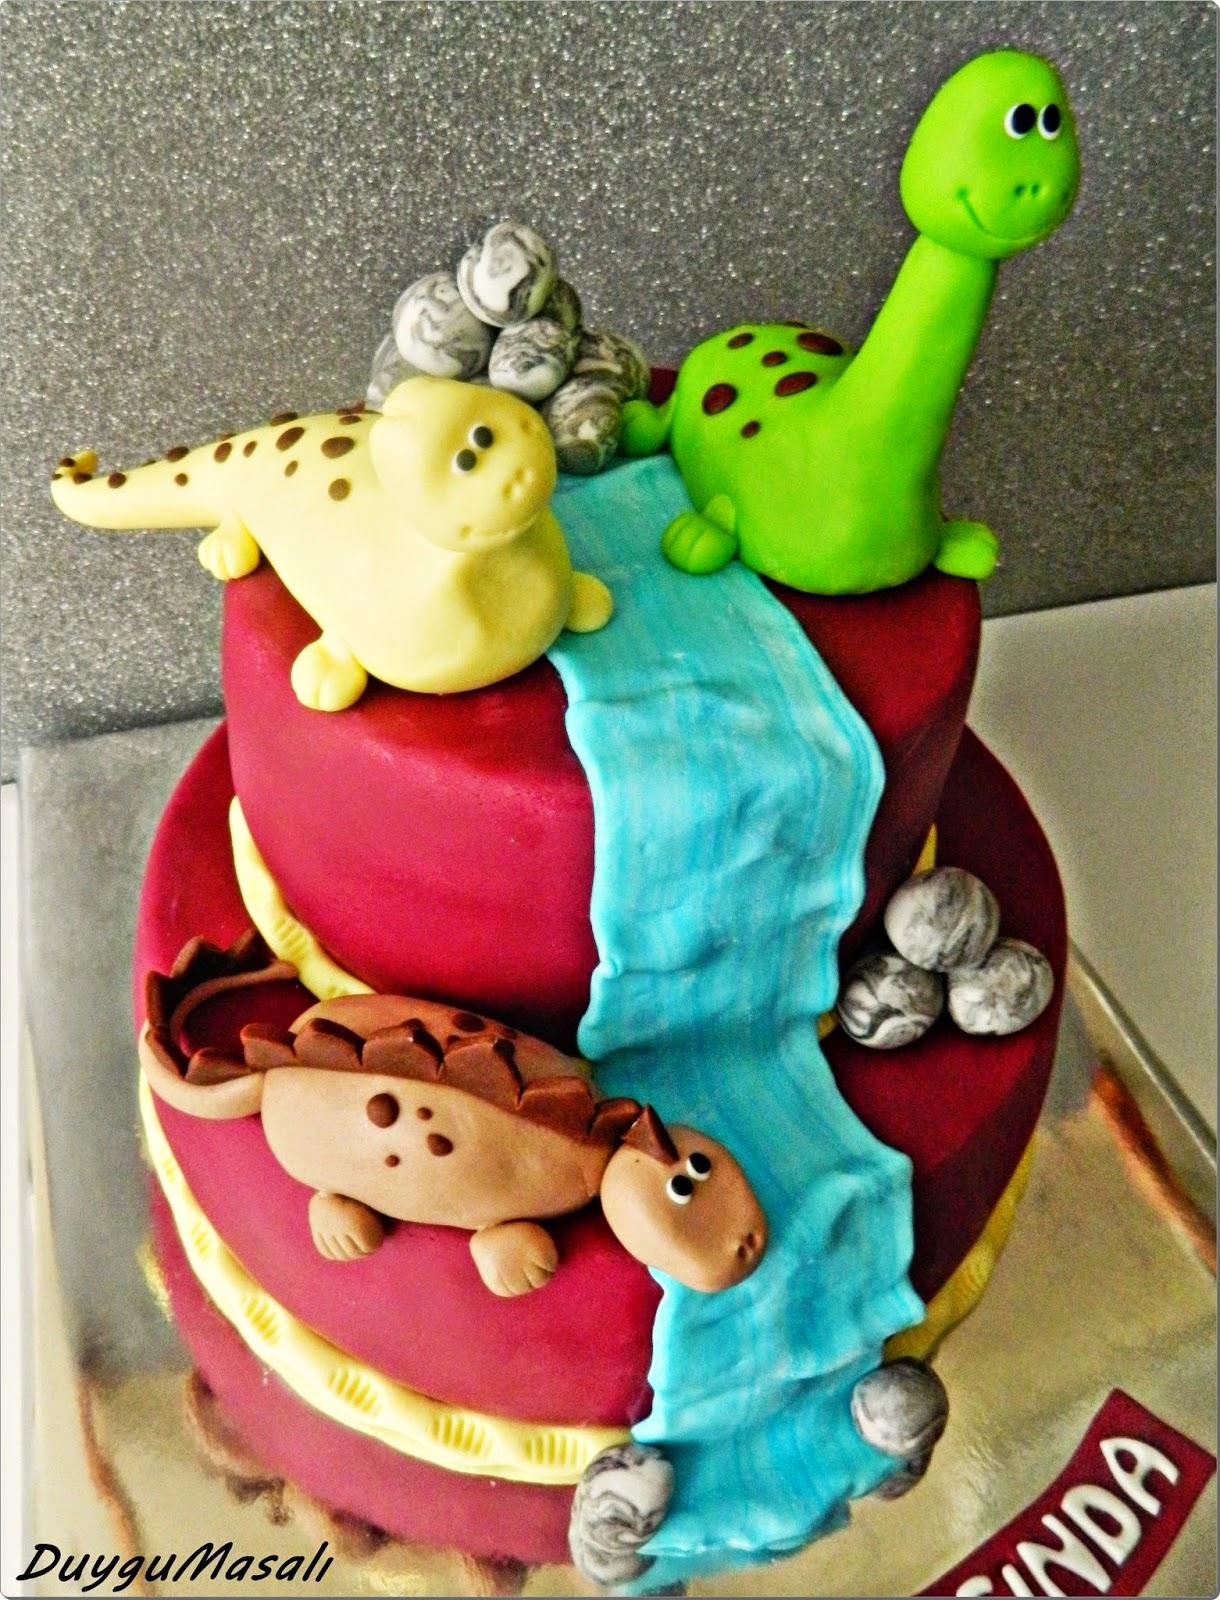 edirne dinozor butik pasta